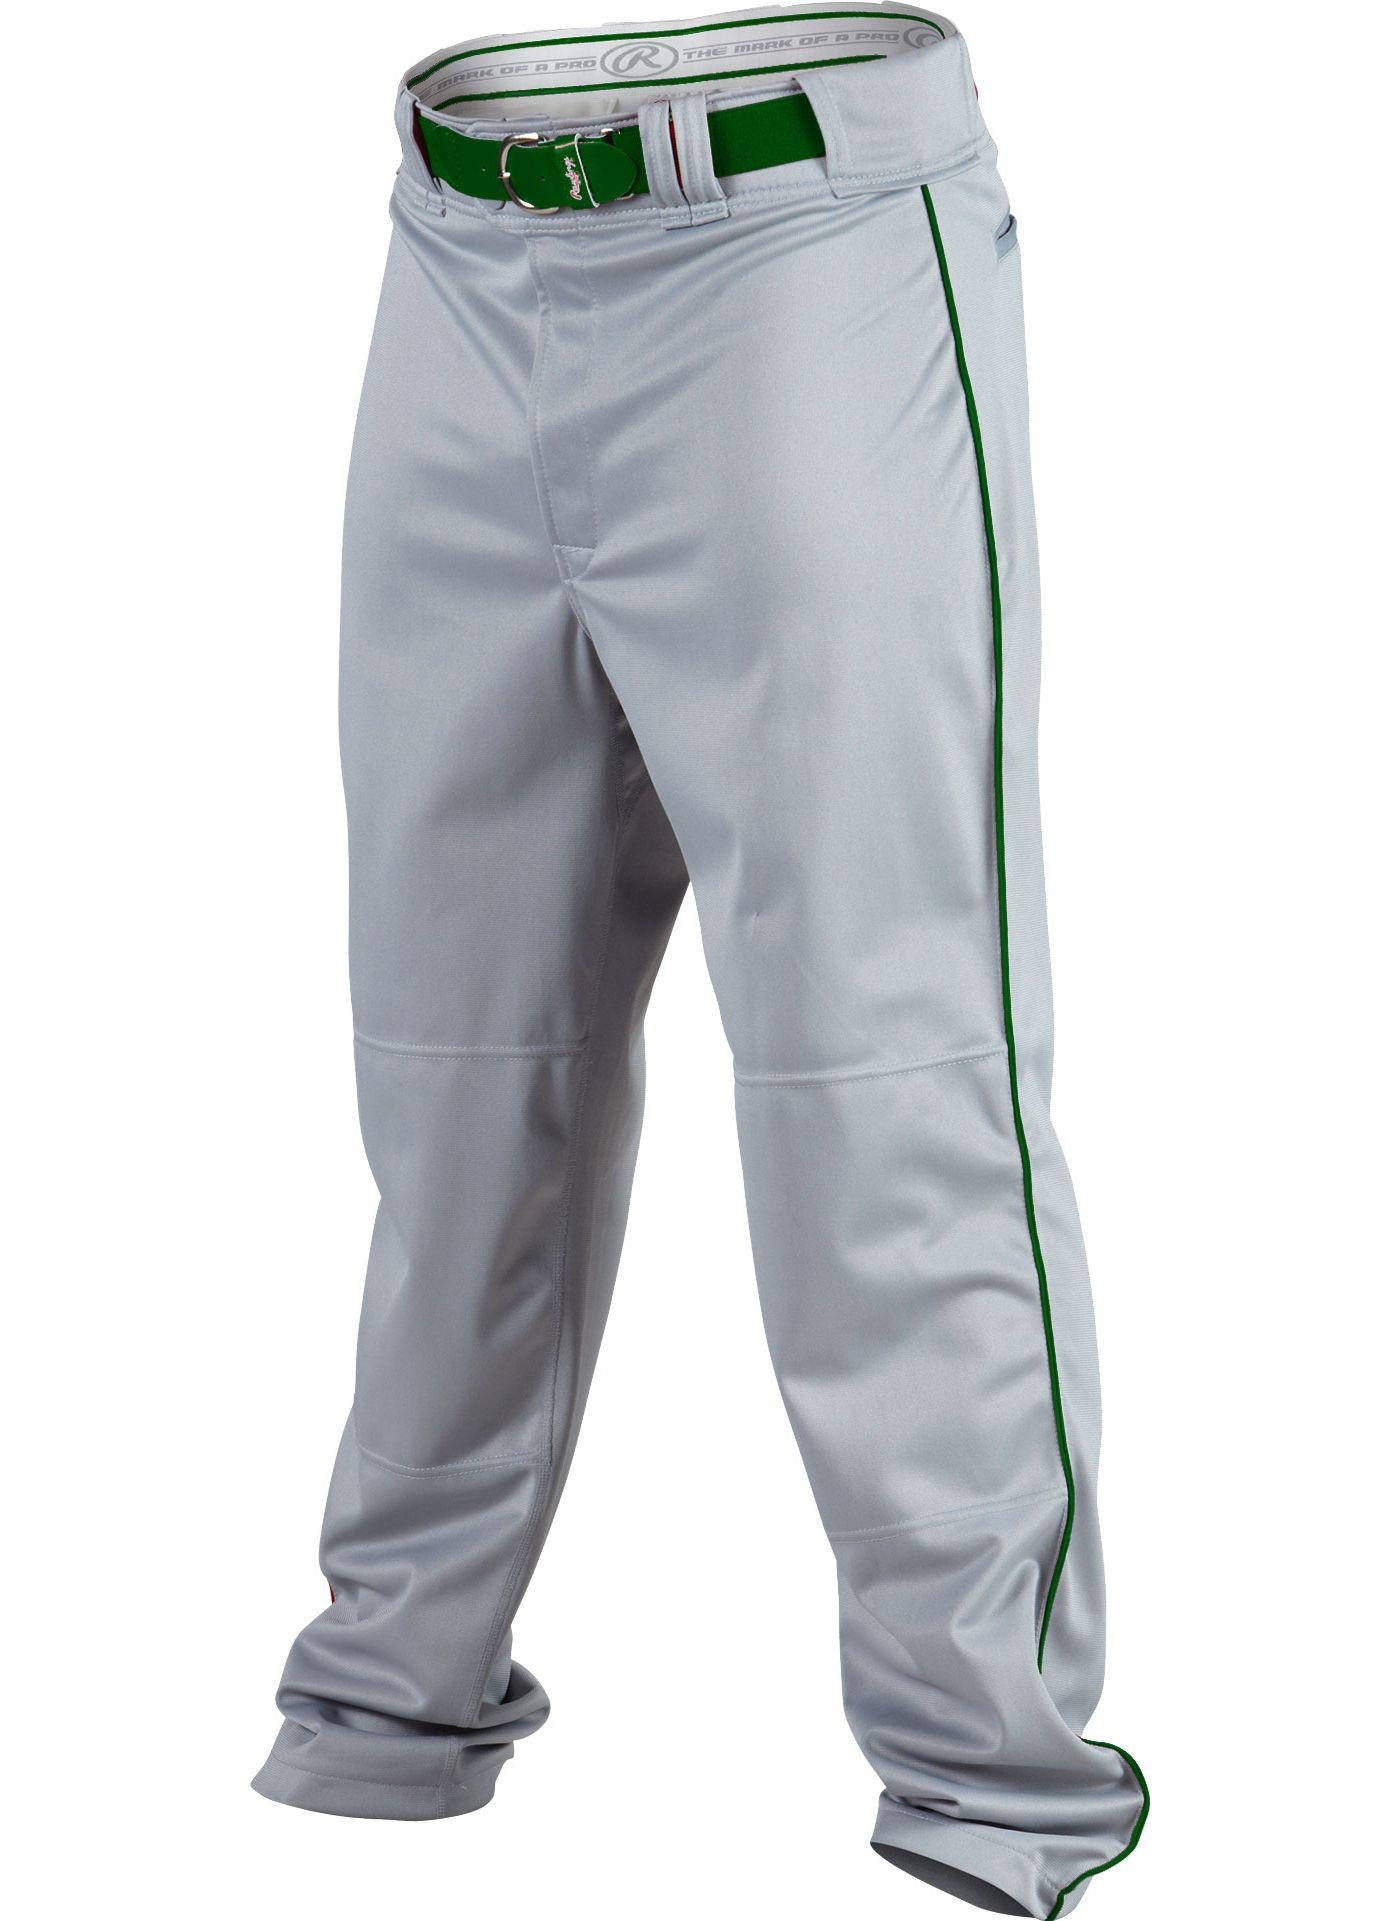 Rawlings Men's Premium Plated Piped Baseball Pants